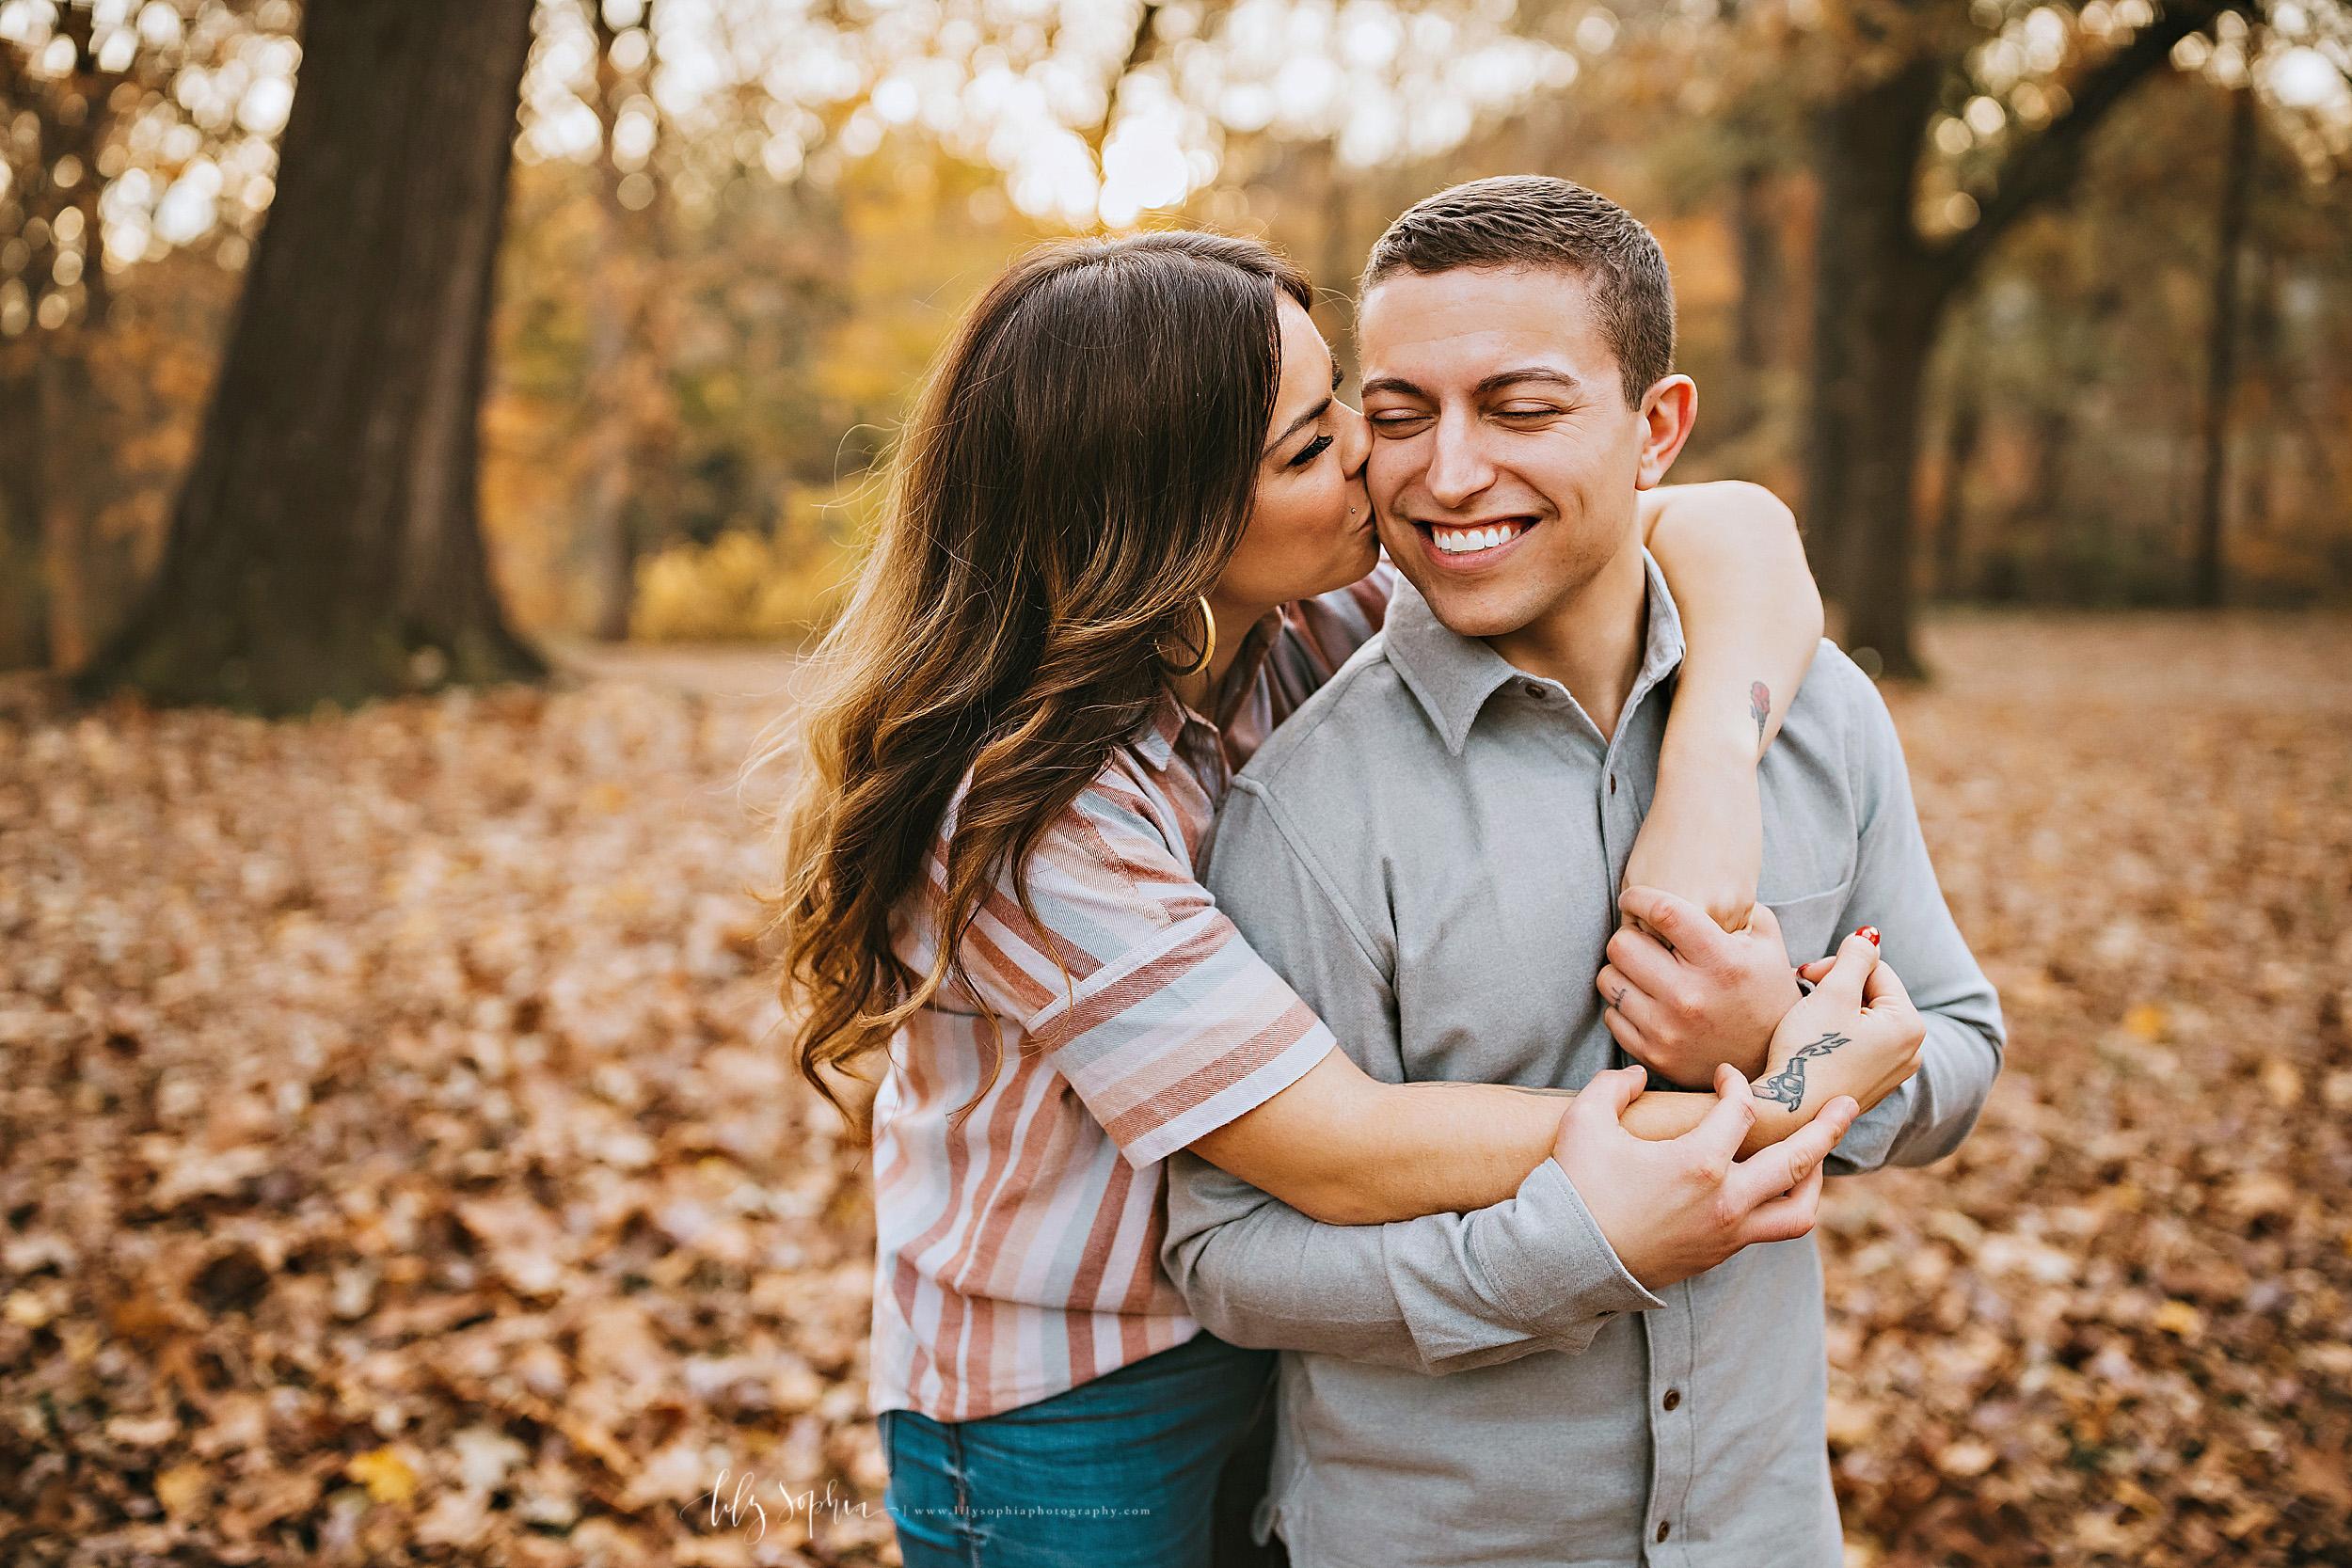 atlanta-reynoldstown-peoplestown-decatur-sandy-springs-buckhead-virginia-highlands-west-end-decatur-lily-sophia-photography-outdoor-fall-couples-photos_1487.jpg